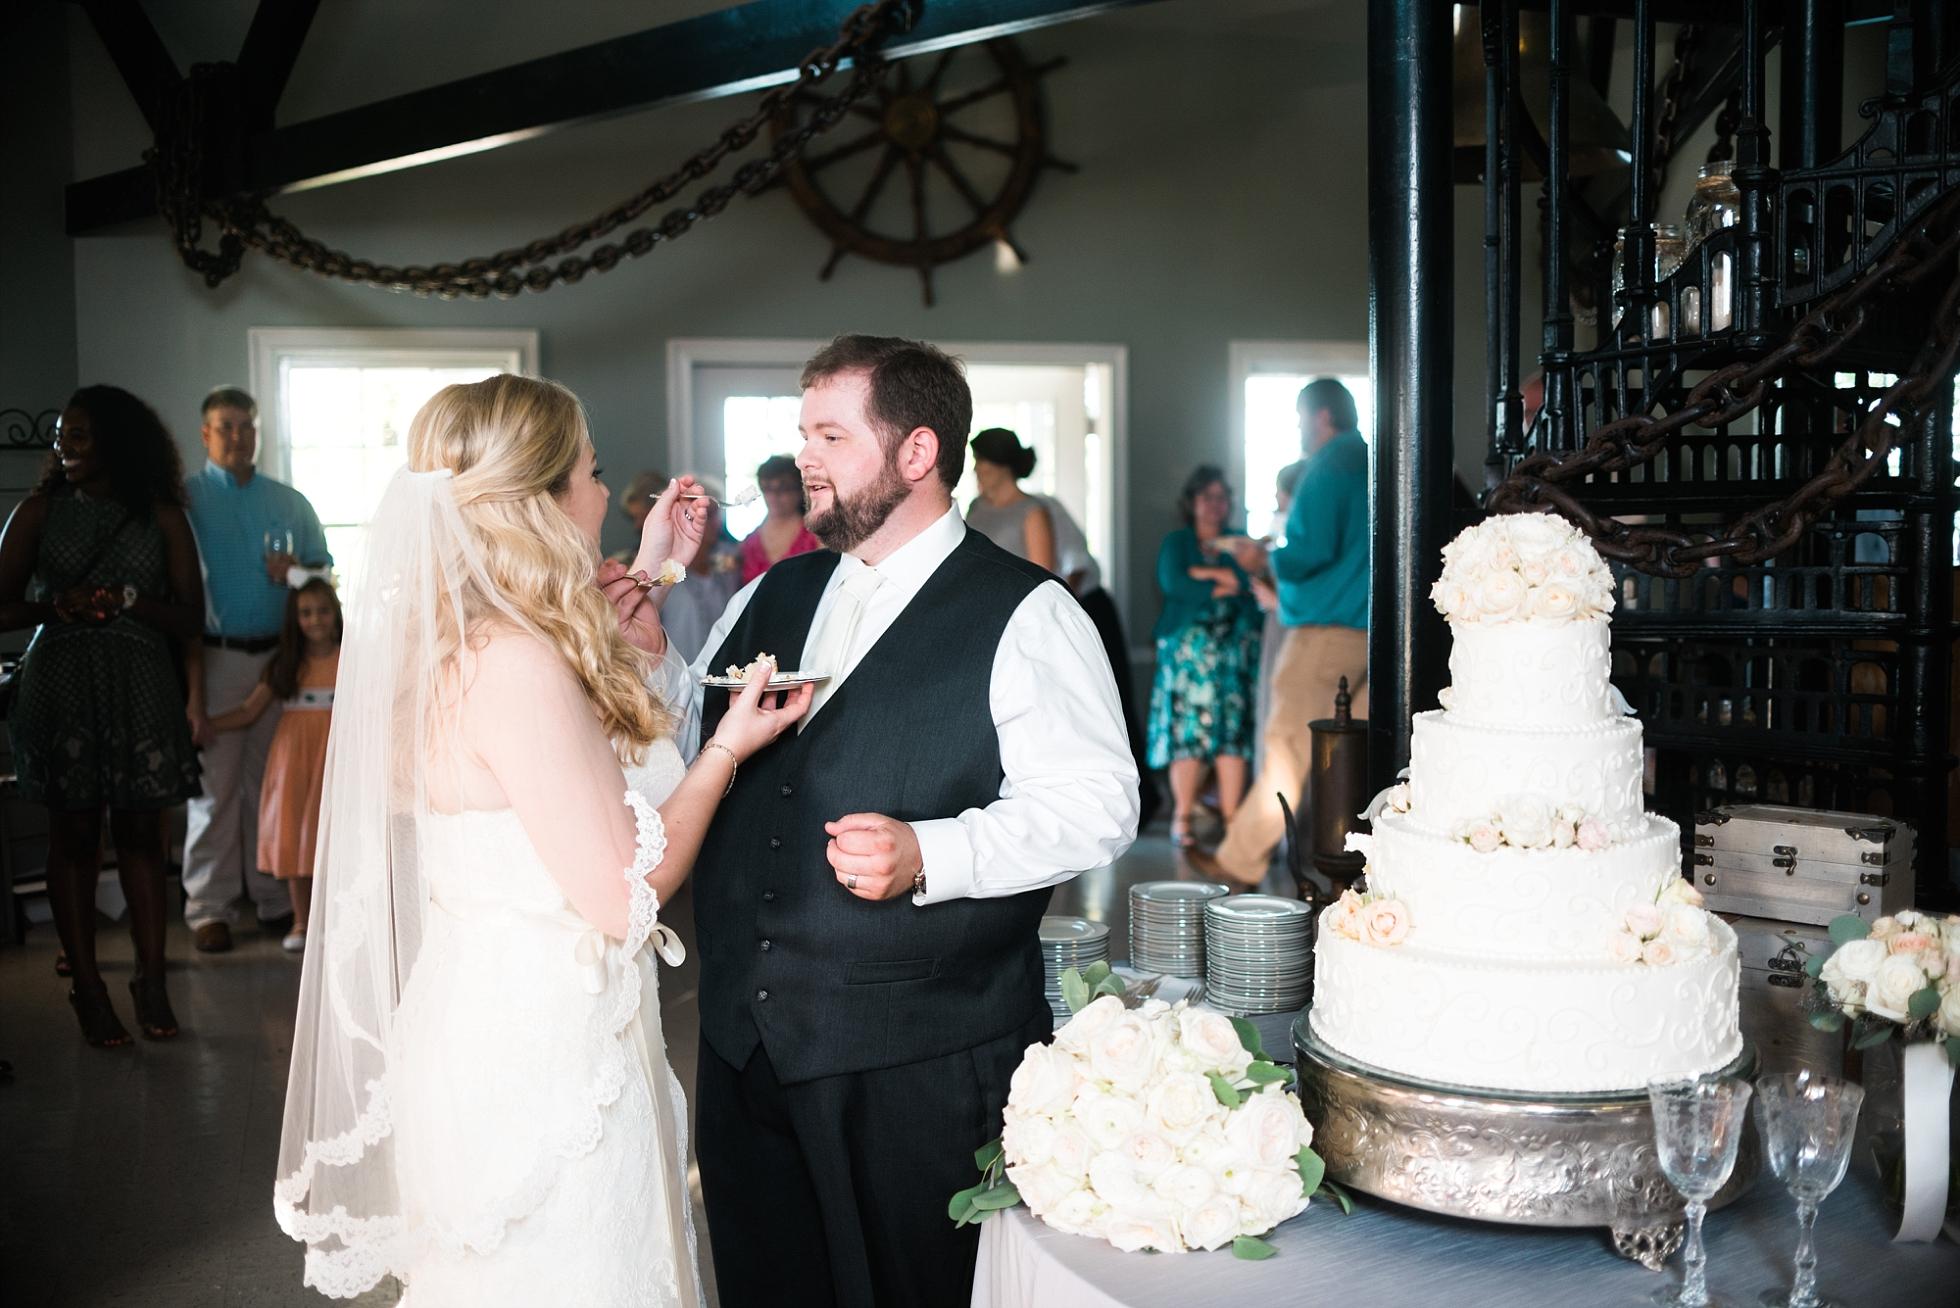 Cake Cutting | Kyle & Erin | Scarbrough Wedding | Children's Harbor | Laura Wilkerson Photography